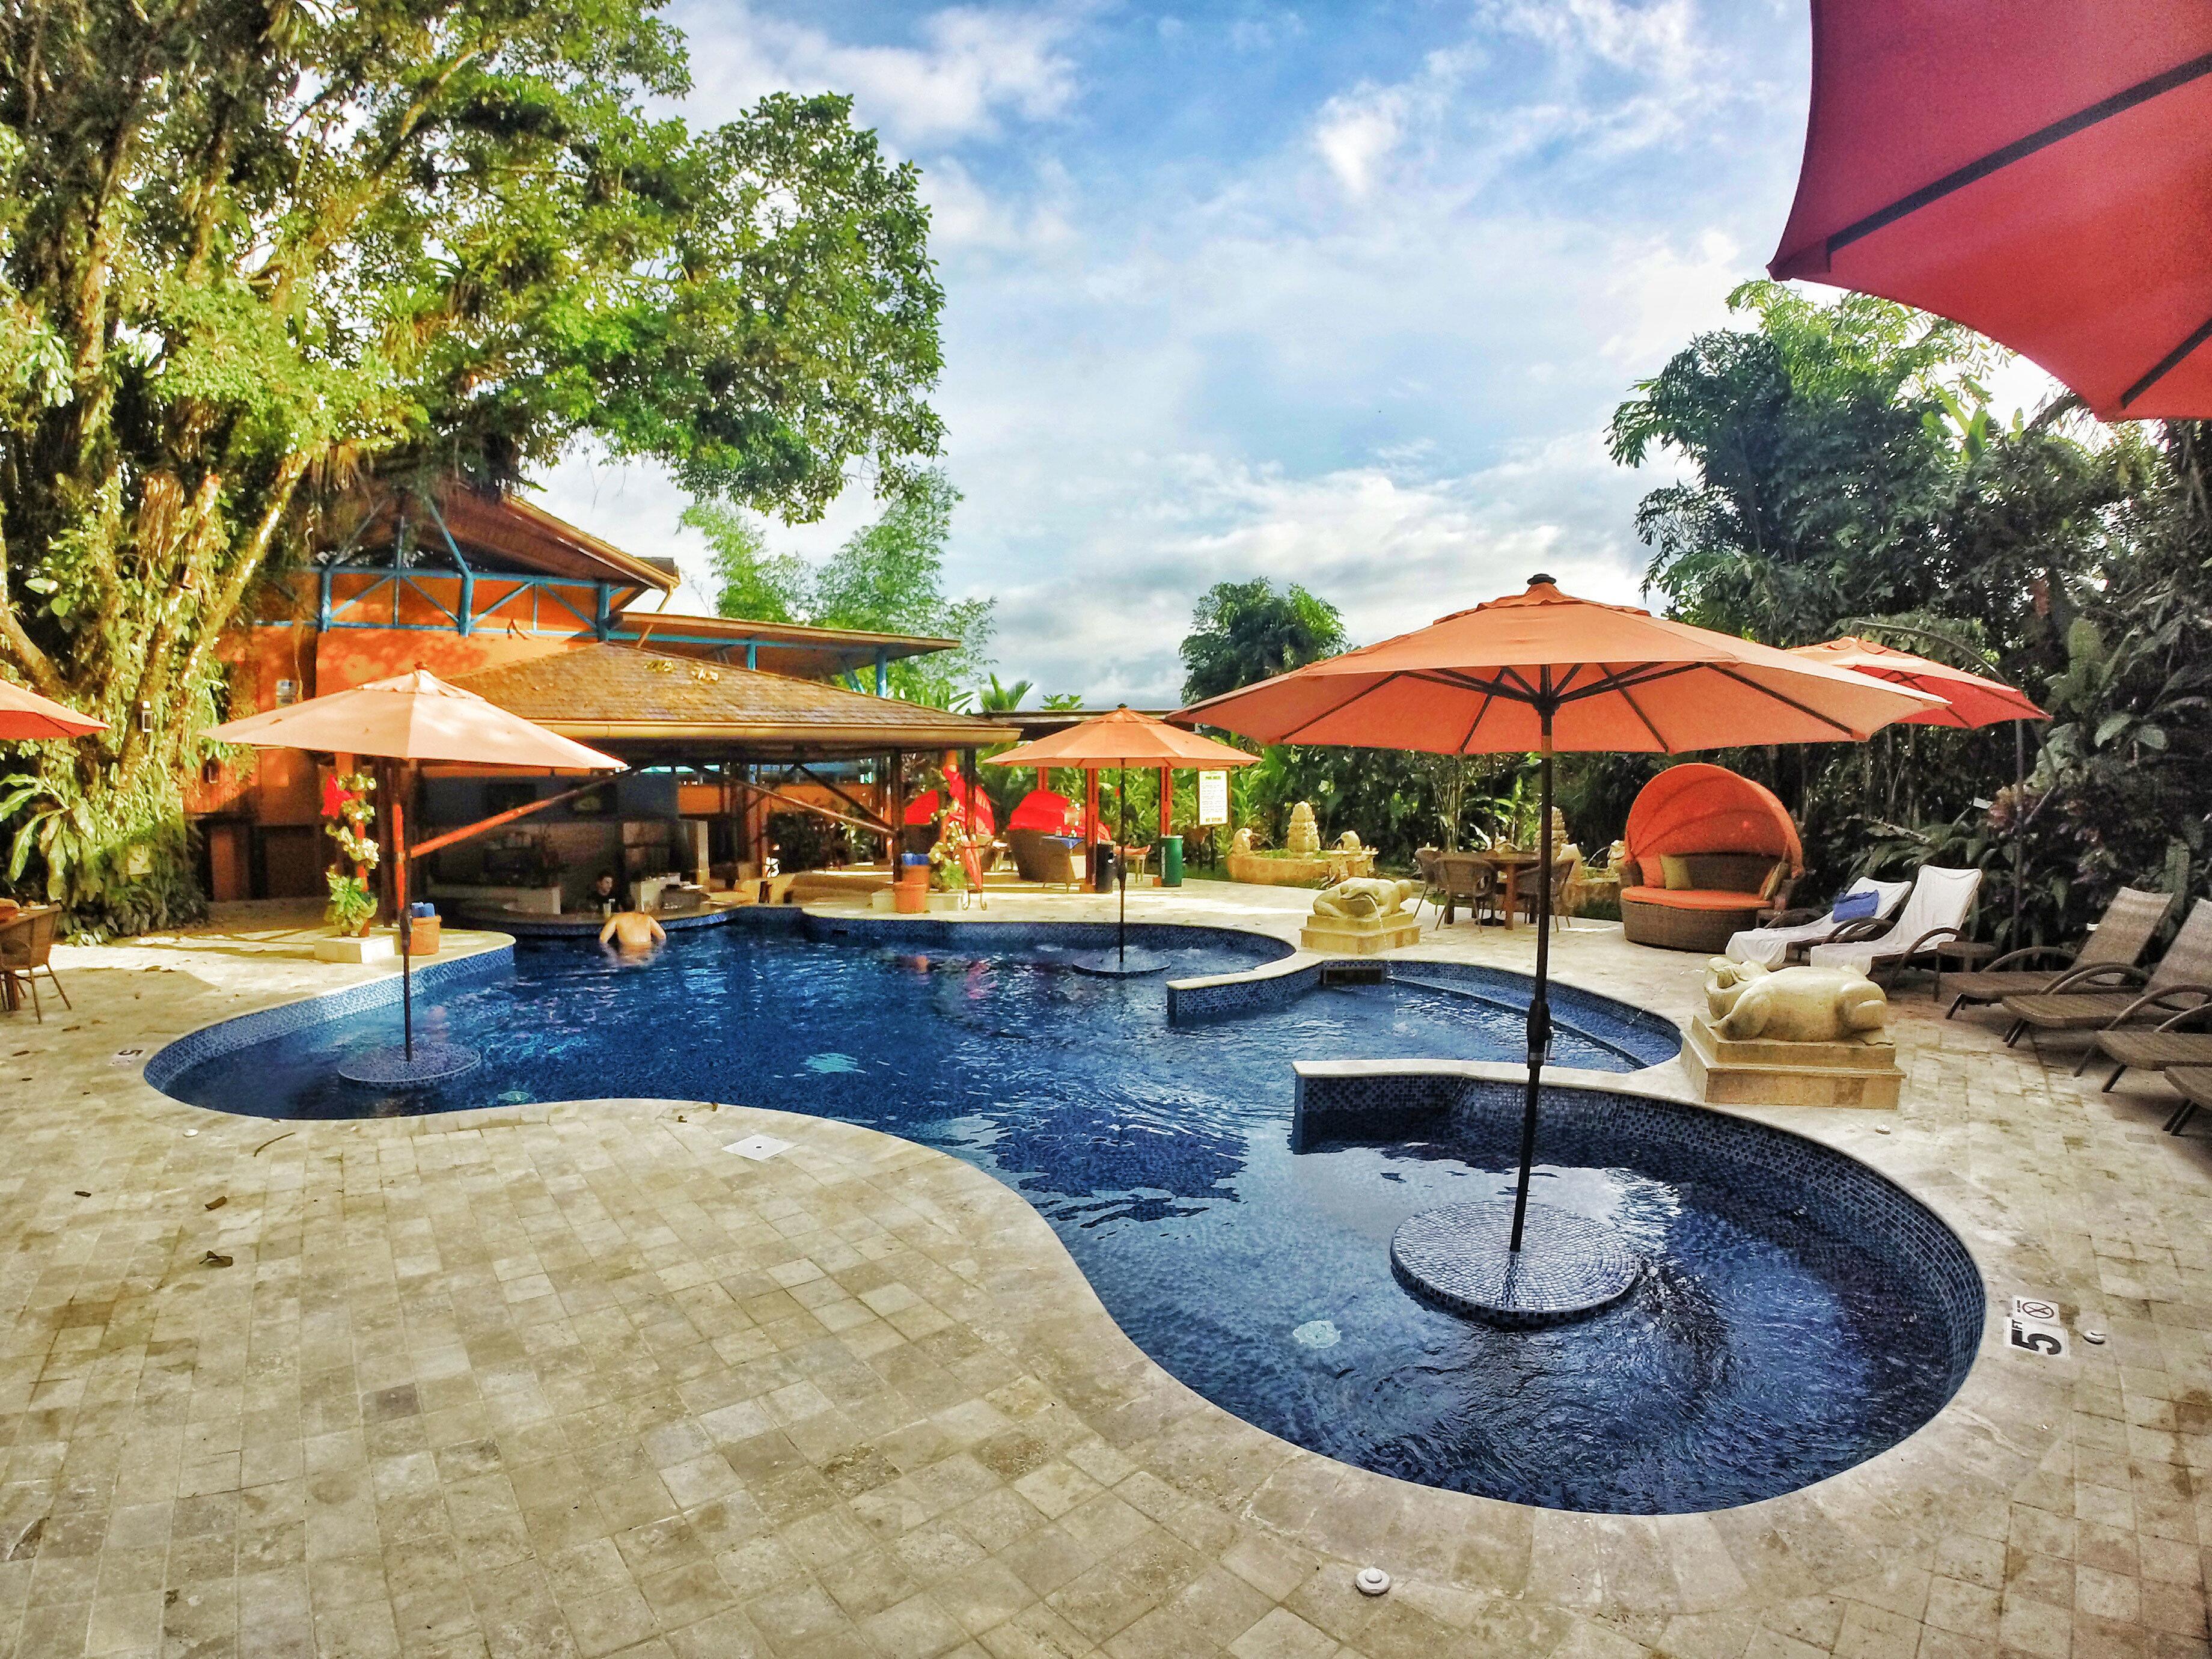 Country Eco Grounds Jungle Pool Romantic Rustic Scenic views tree umbrella ground leisure swimming pool Resort backyard day